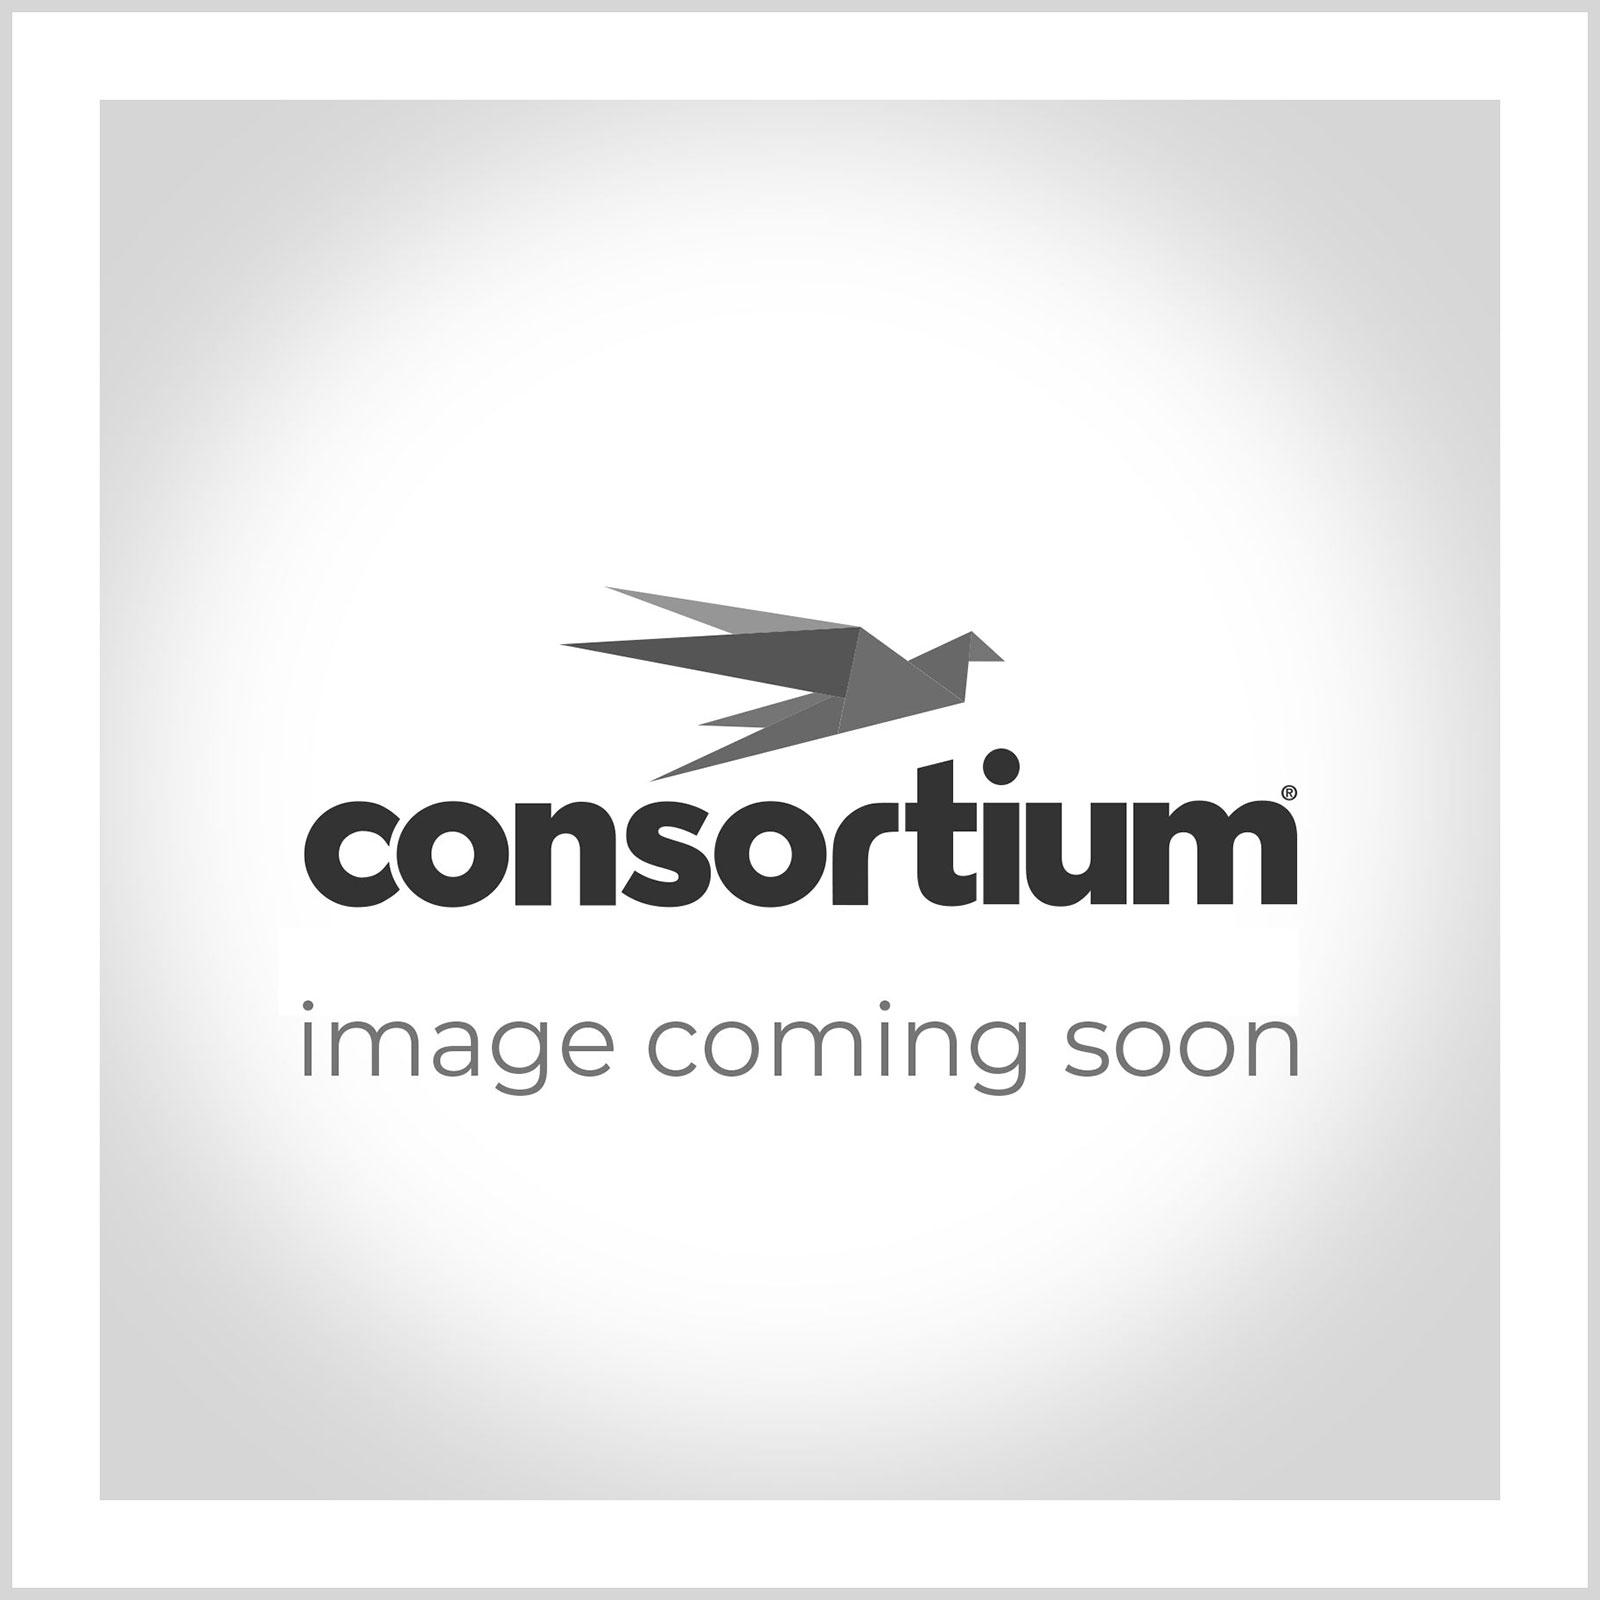 Nite-Glo CO2 Extinguisher